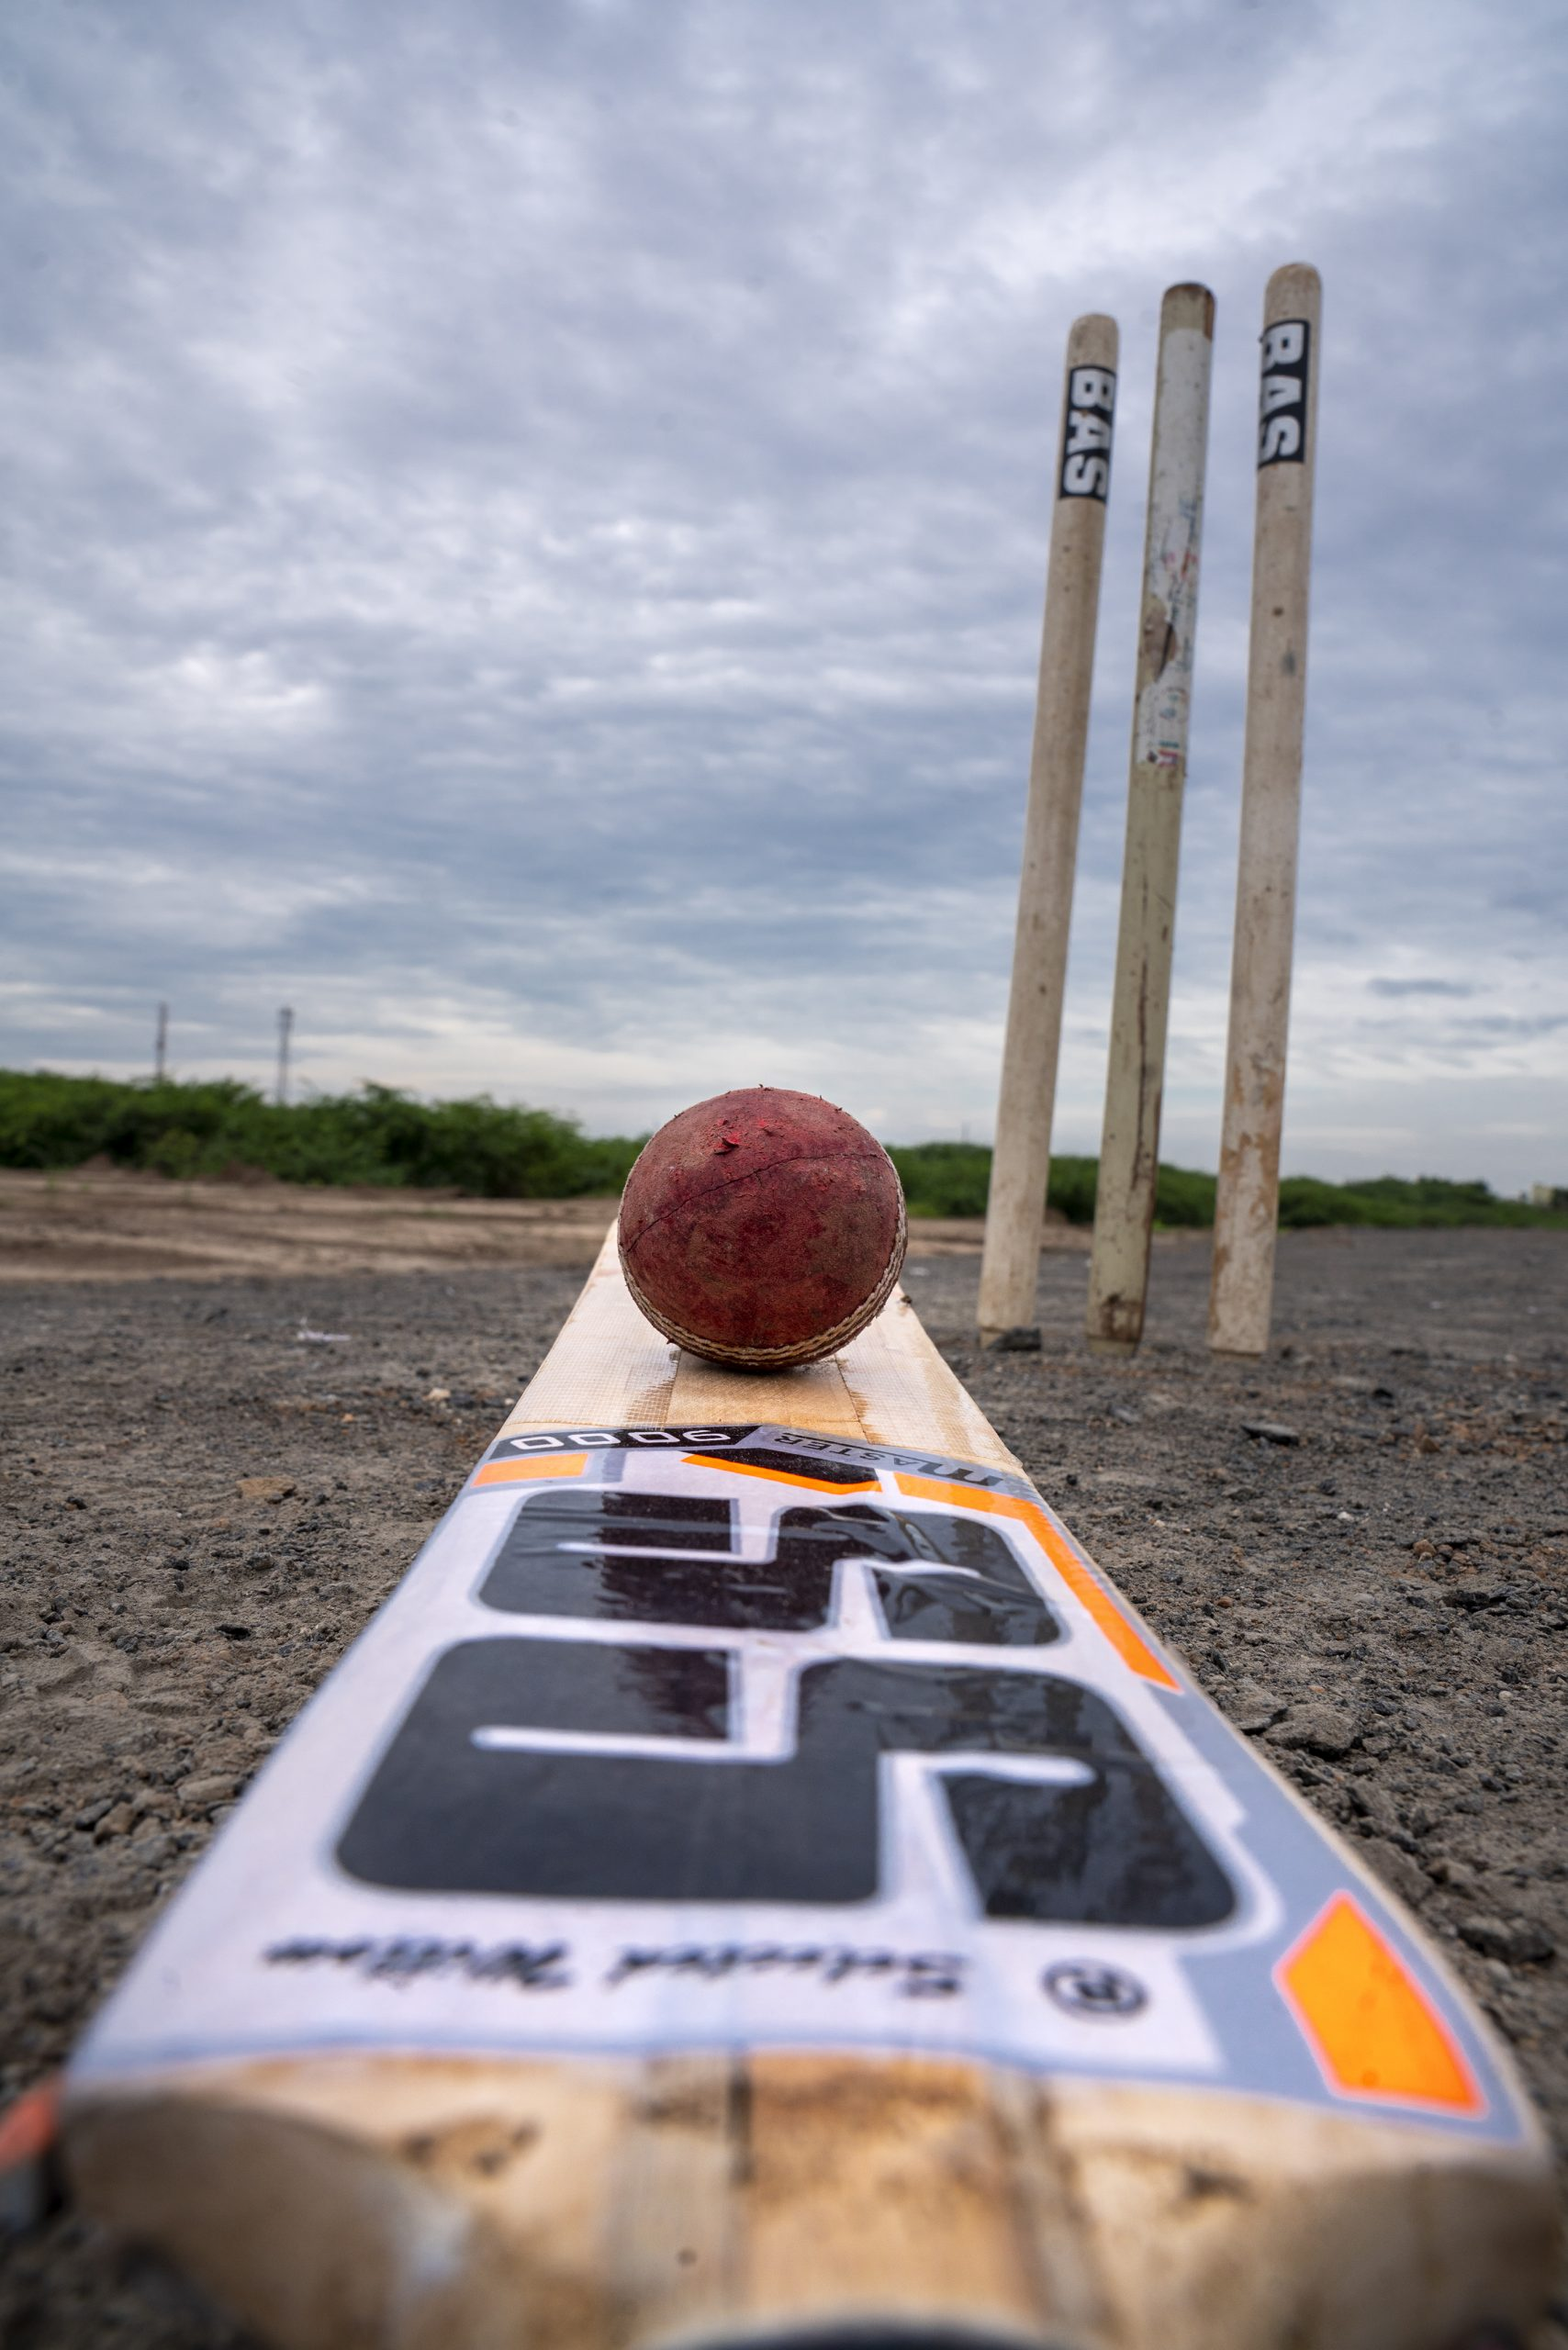 Cricket sports equipment